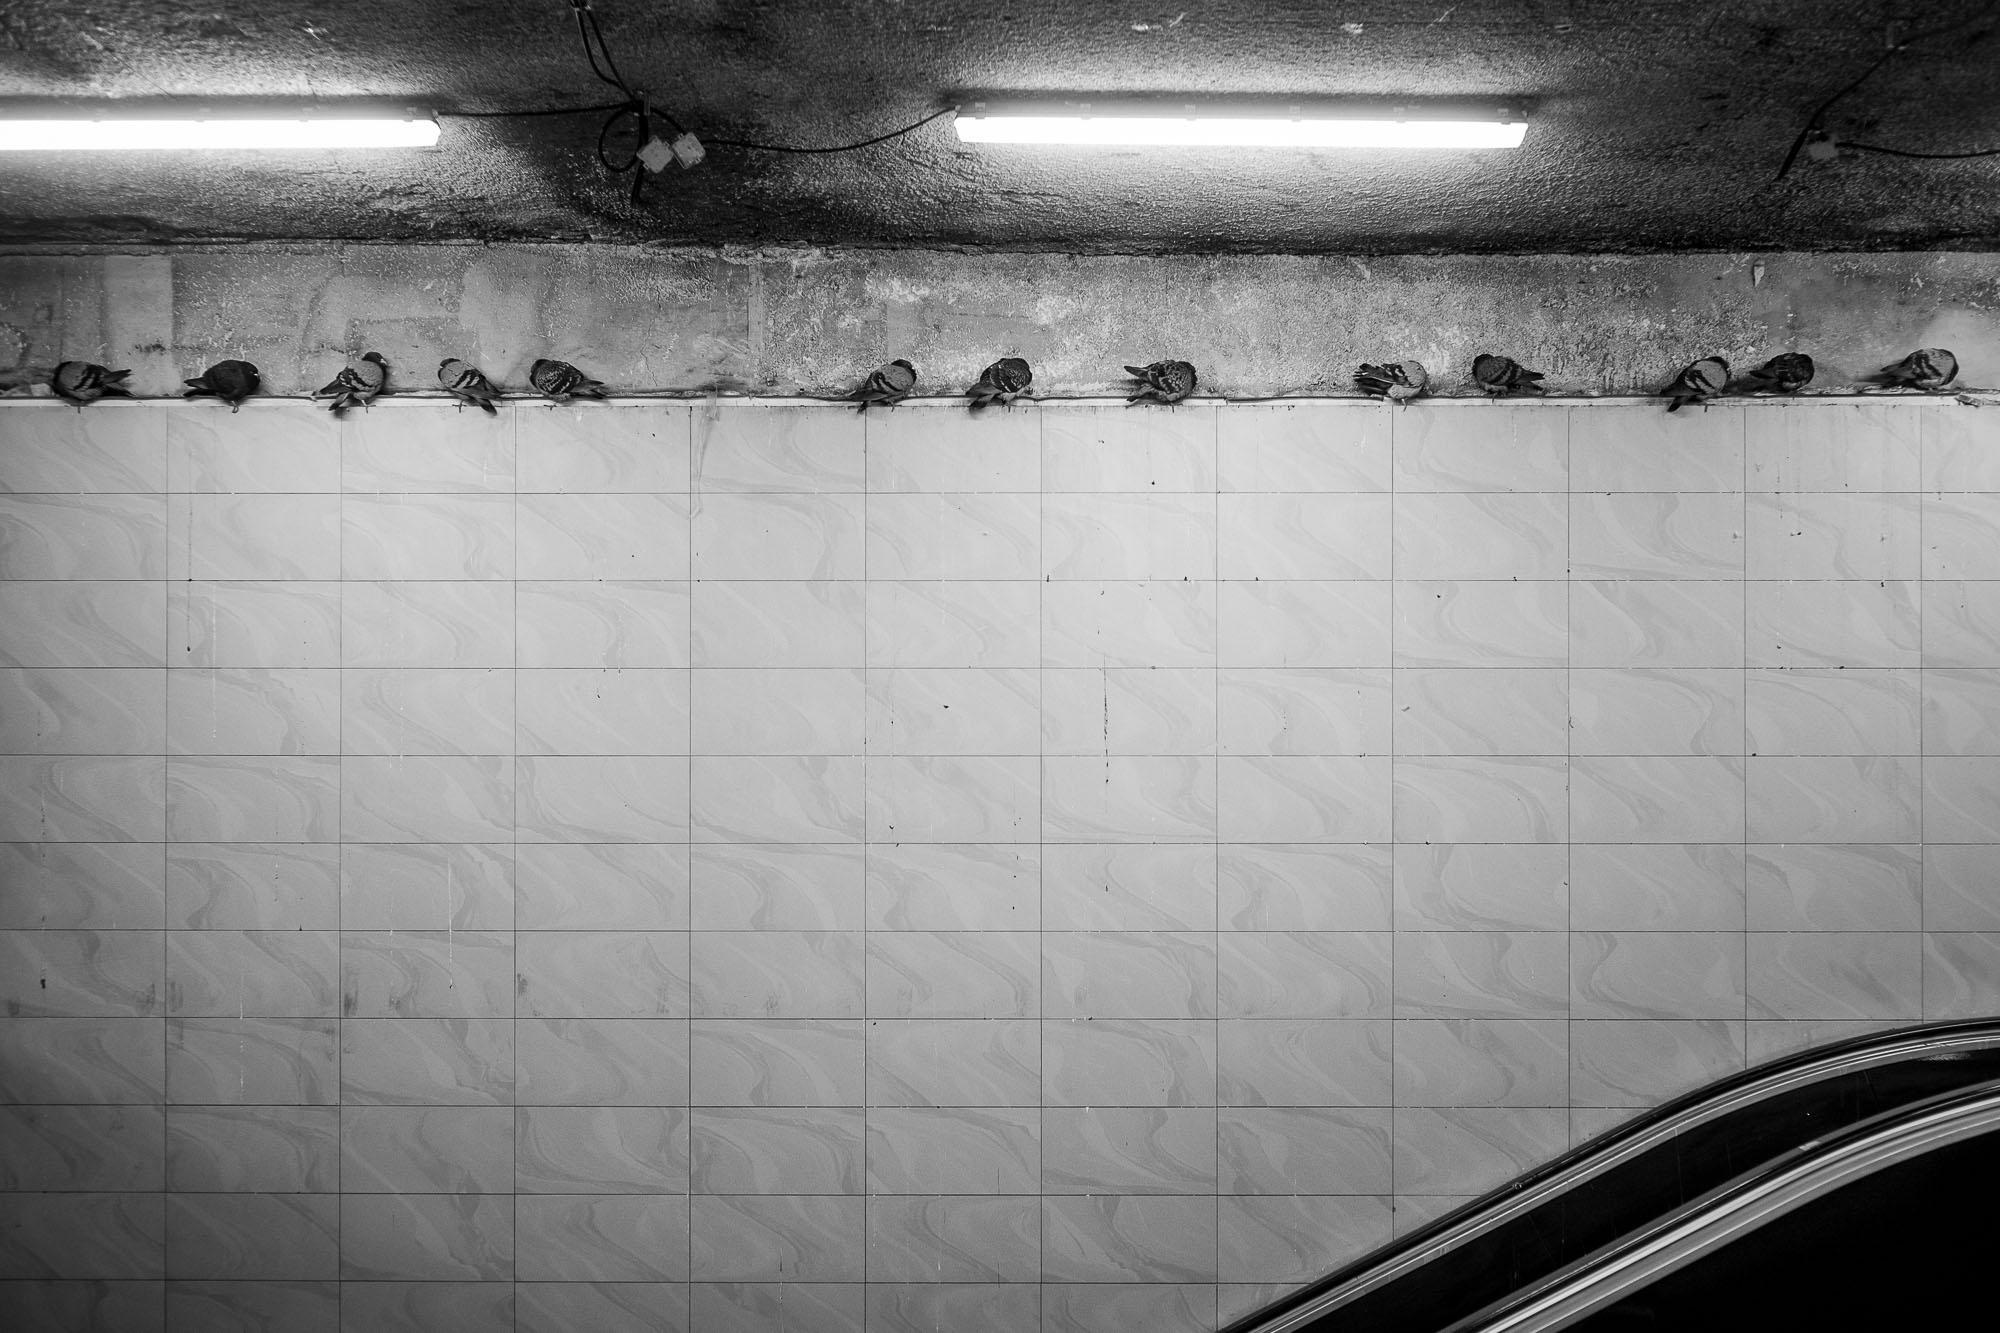 Pigeons on a ledge inside Rüttenscheider Stern subway station